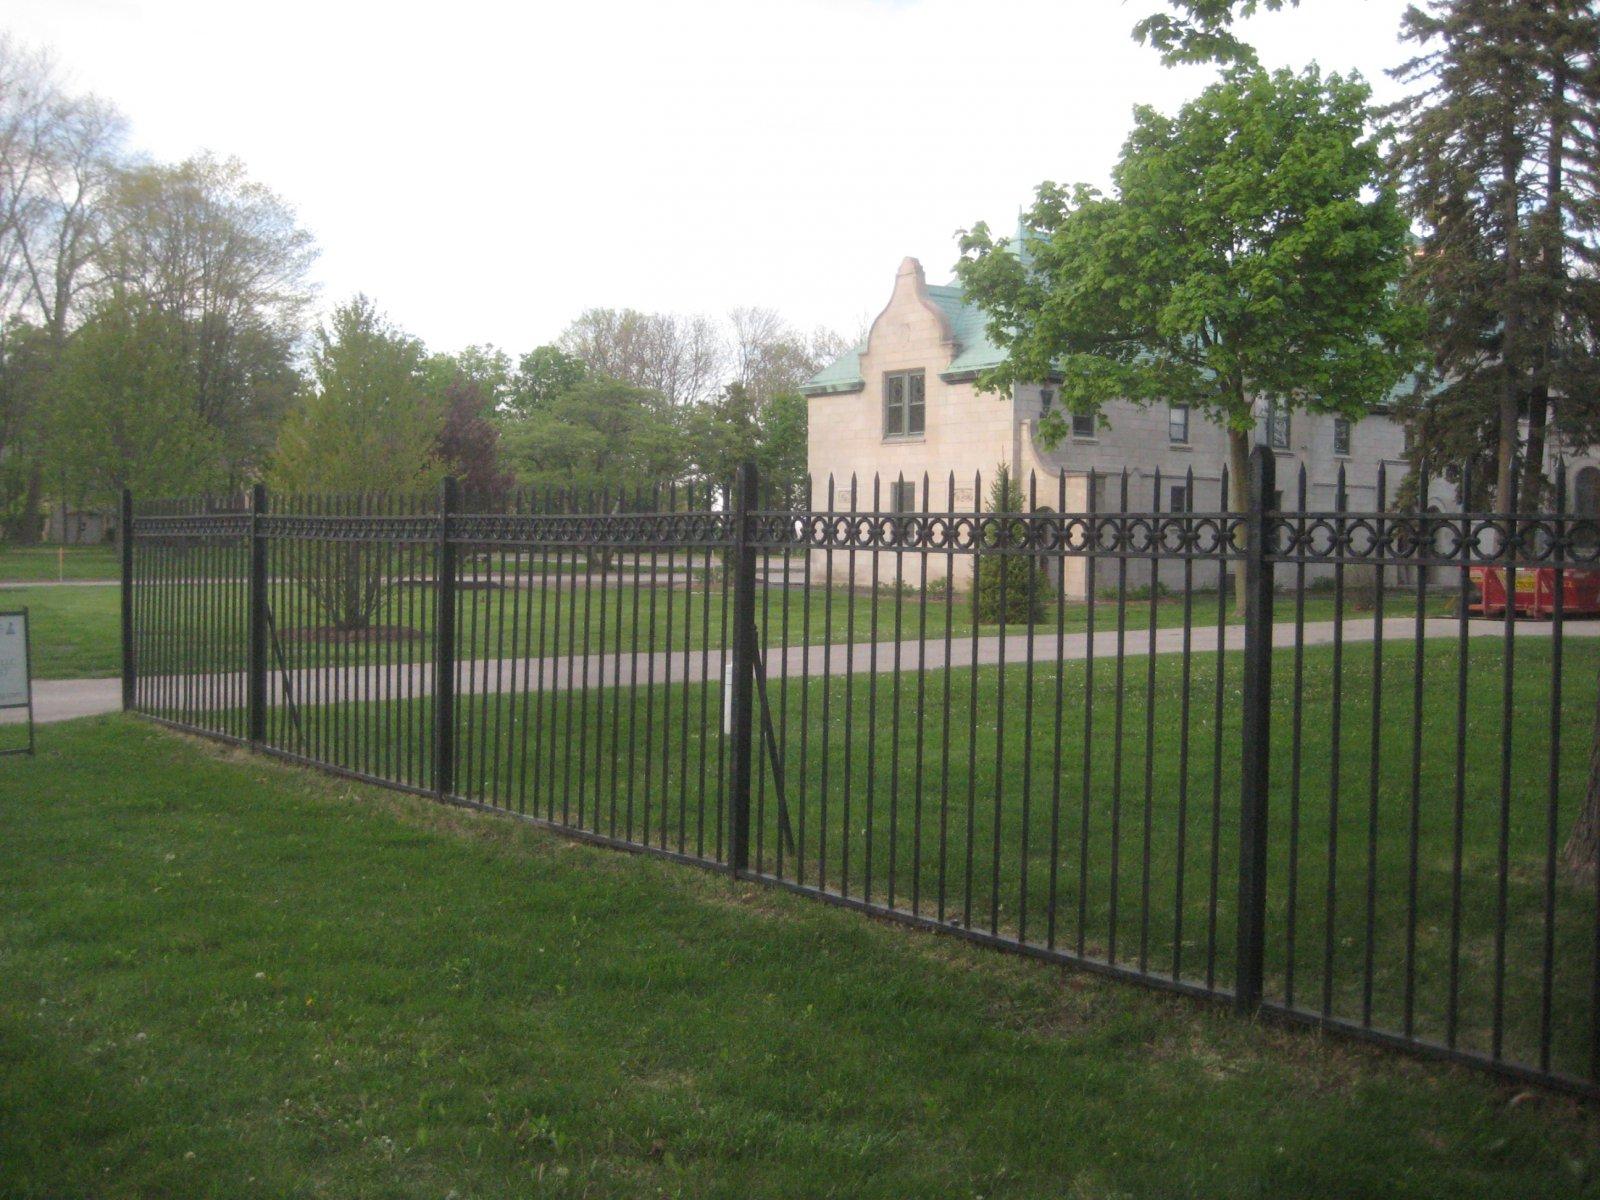 The Mutschler property